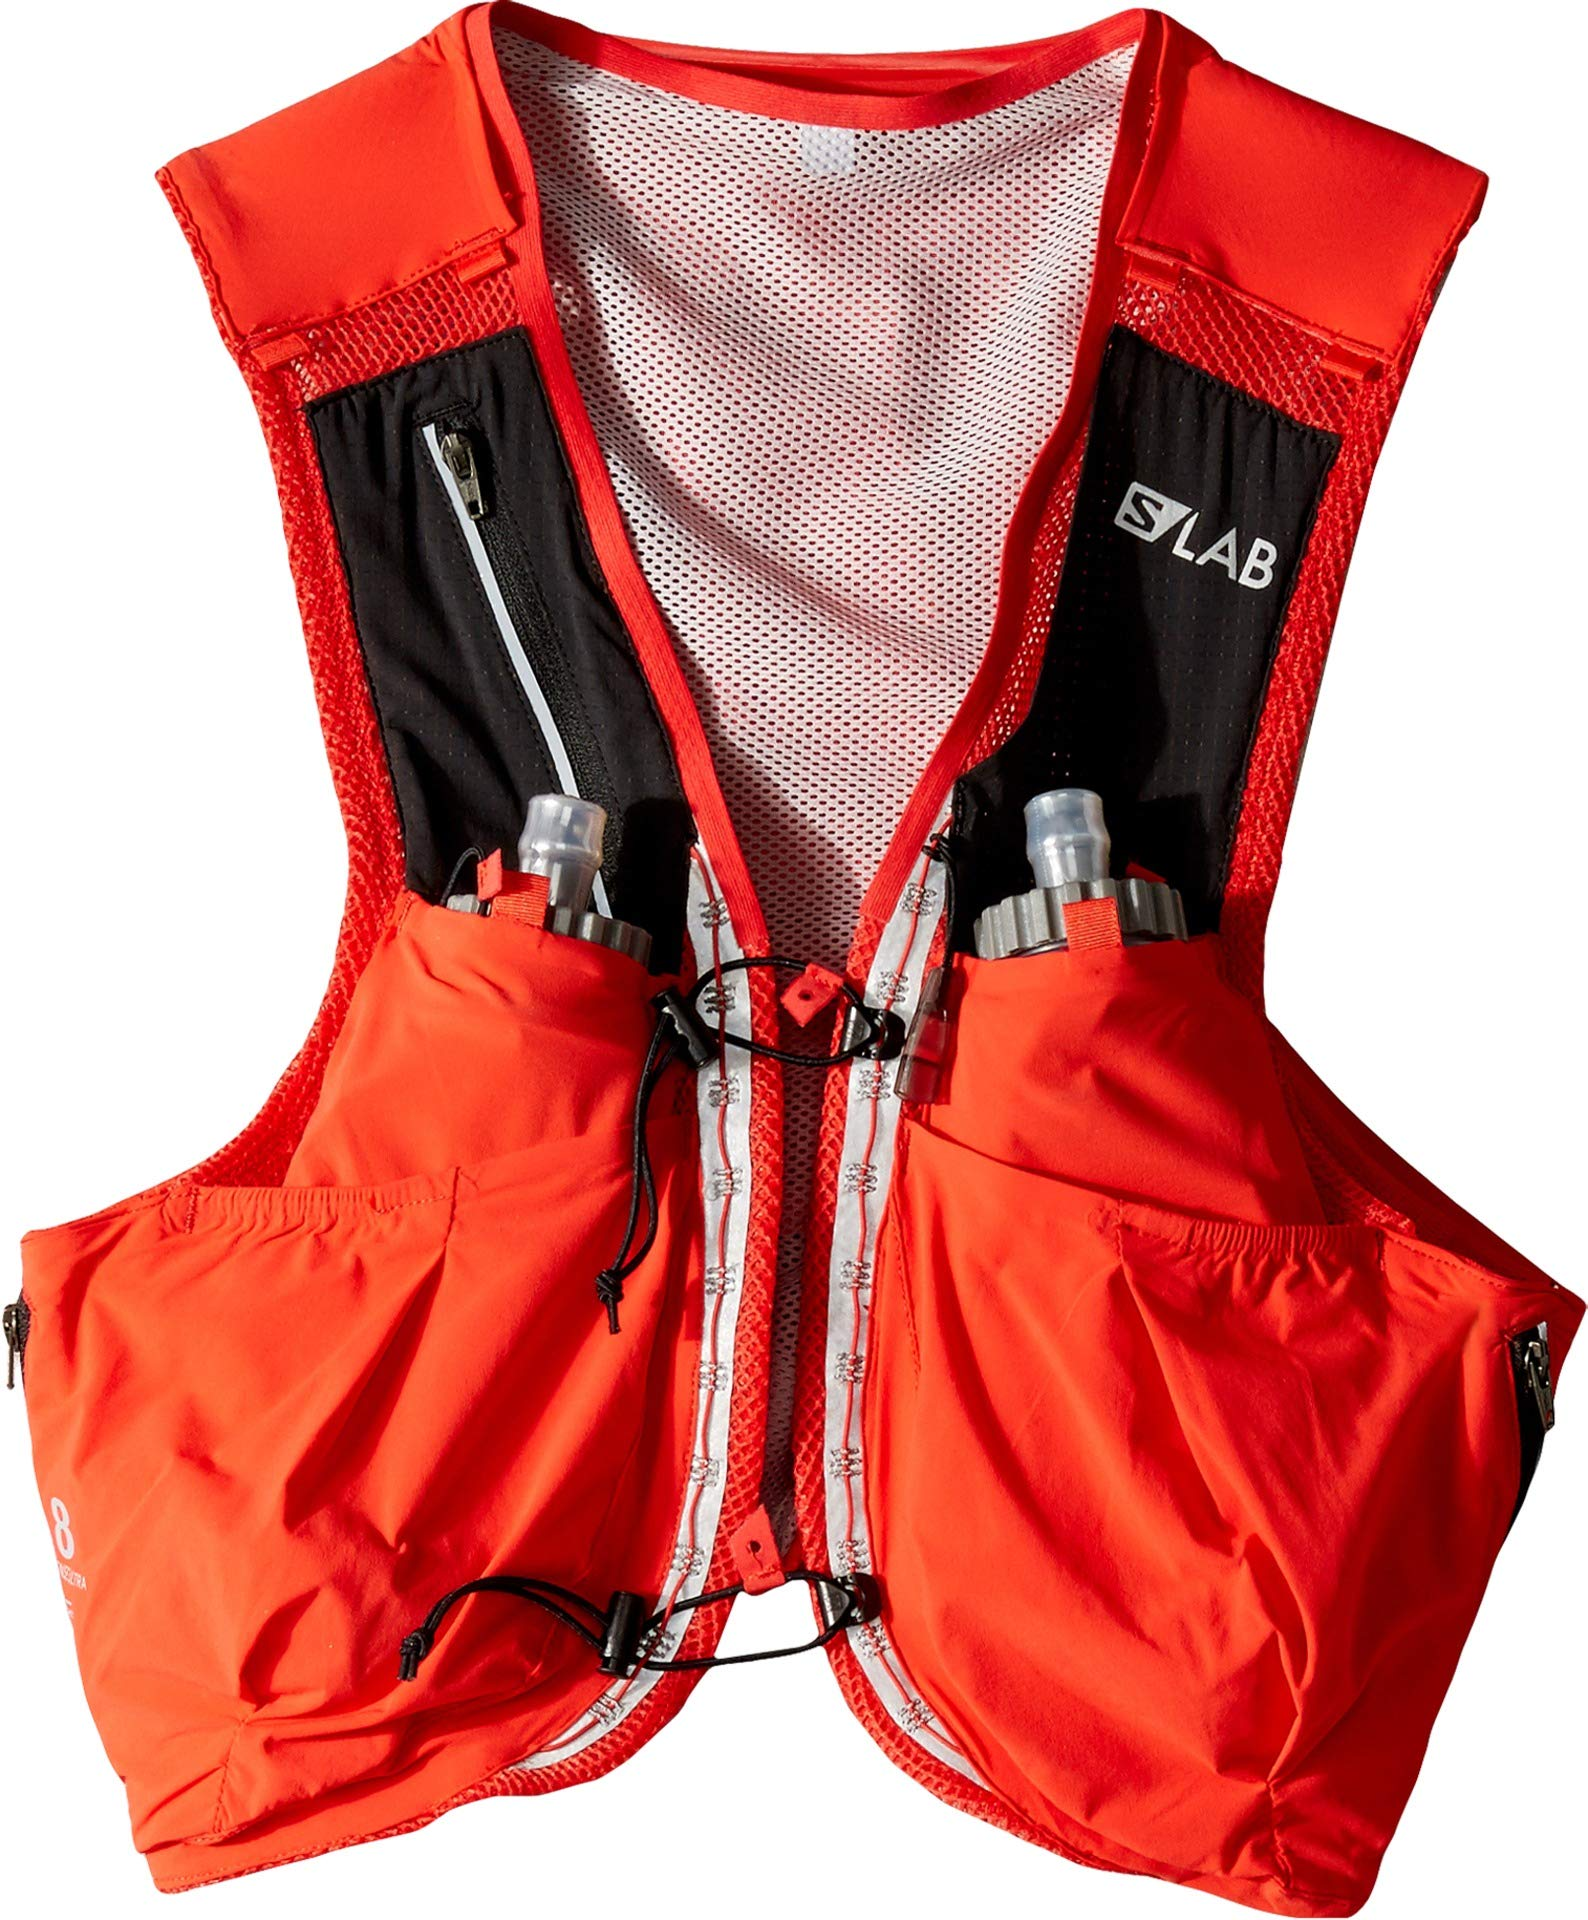 a77a8af765d Salomon Unisex S/Lab Sense Ultra 8 Set Hydration Vest, Racing Red, Medium